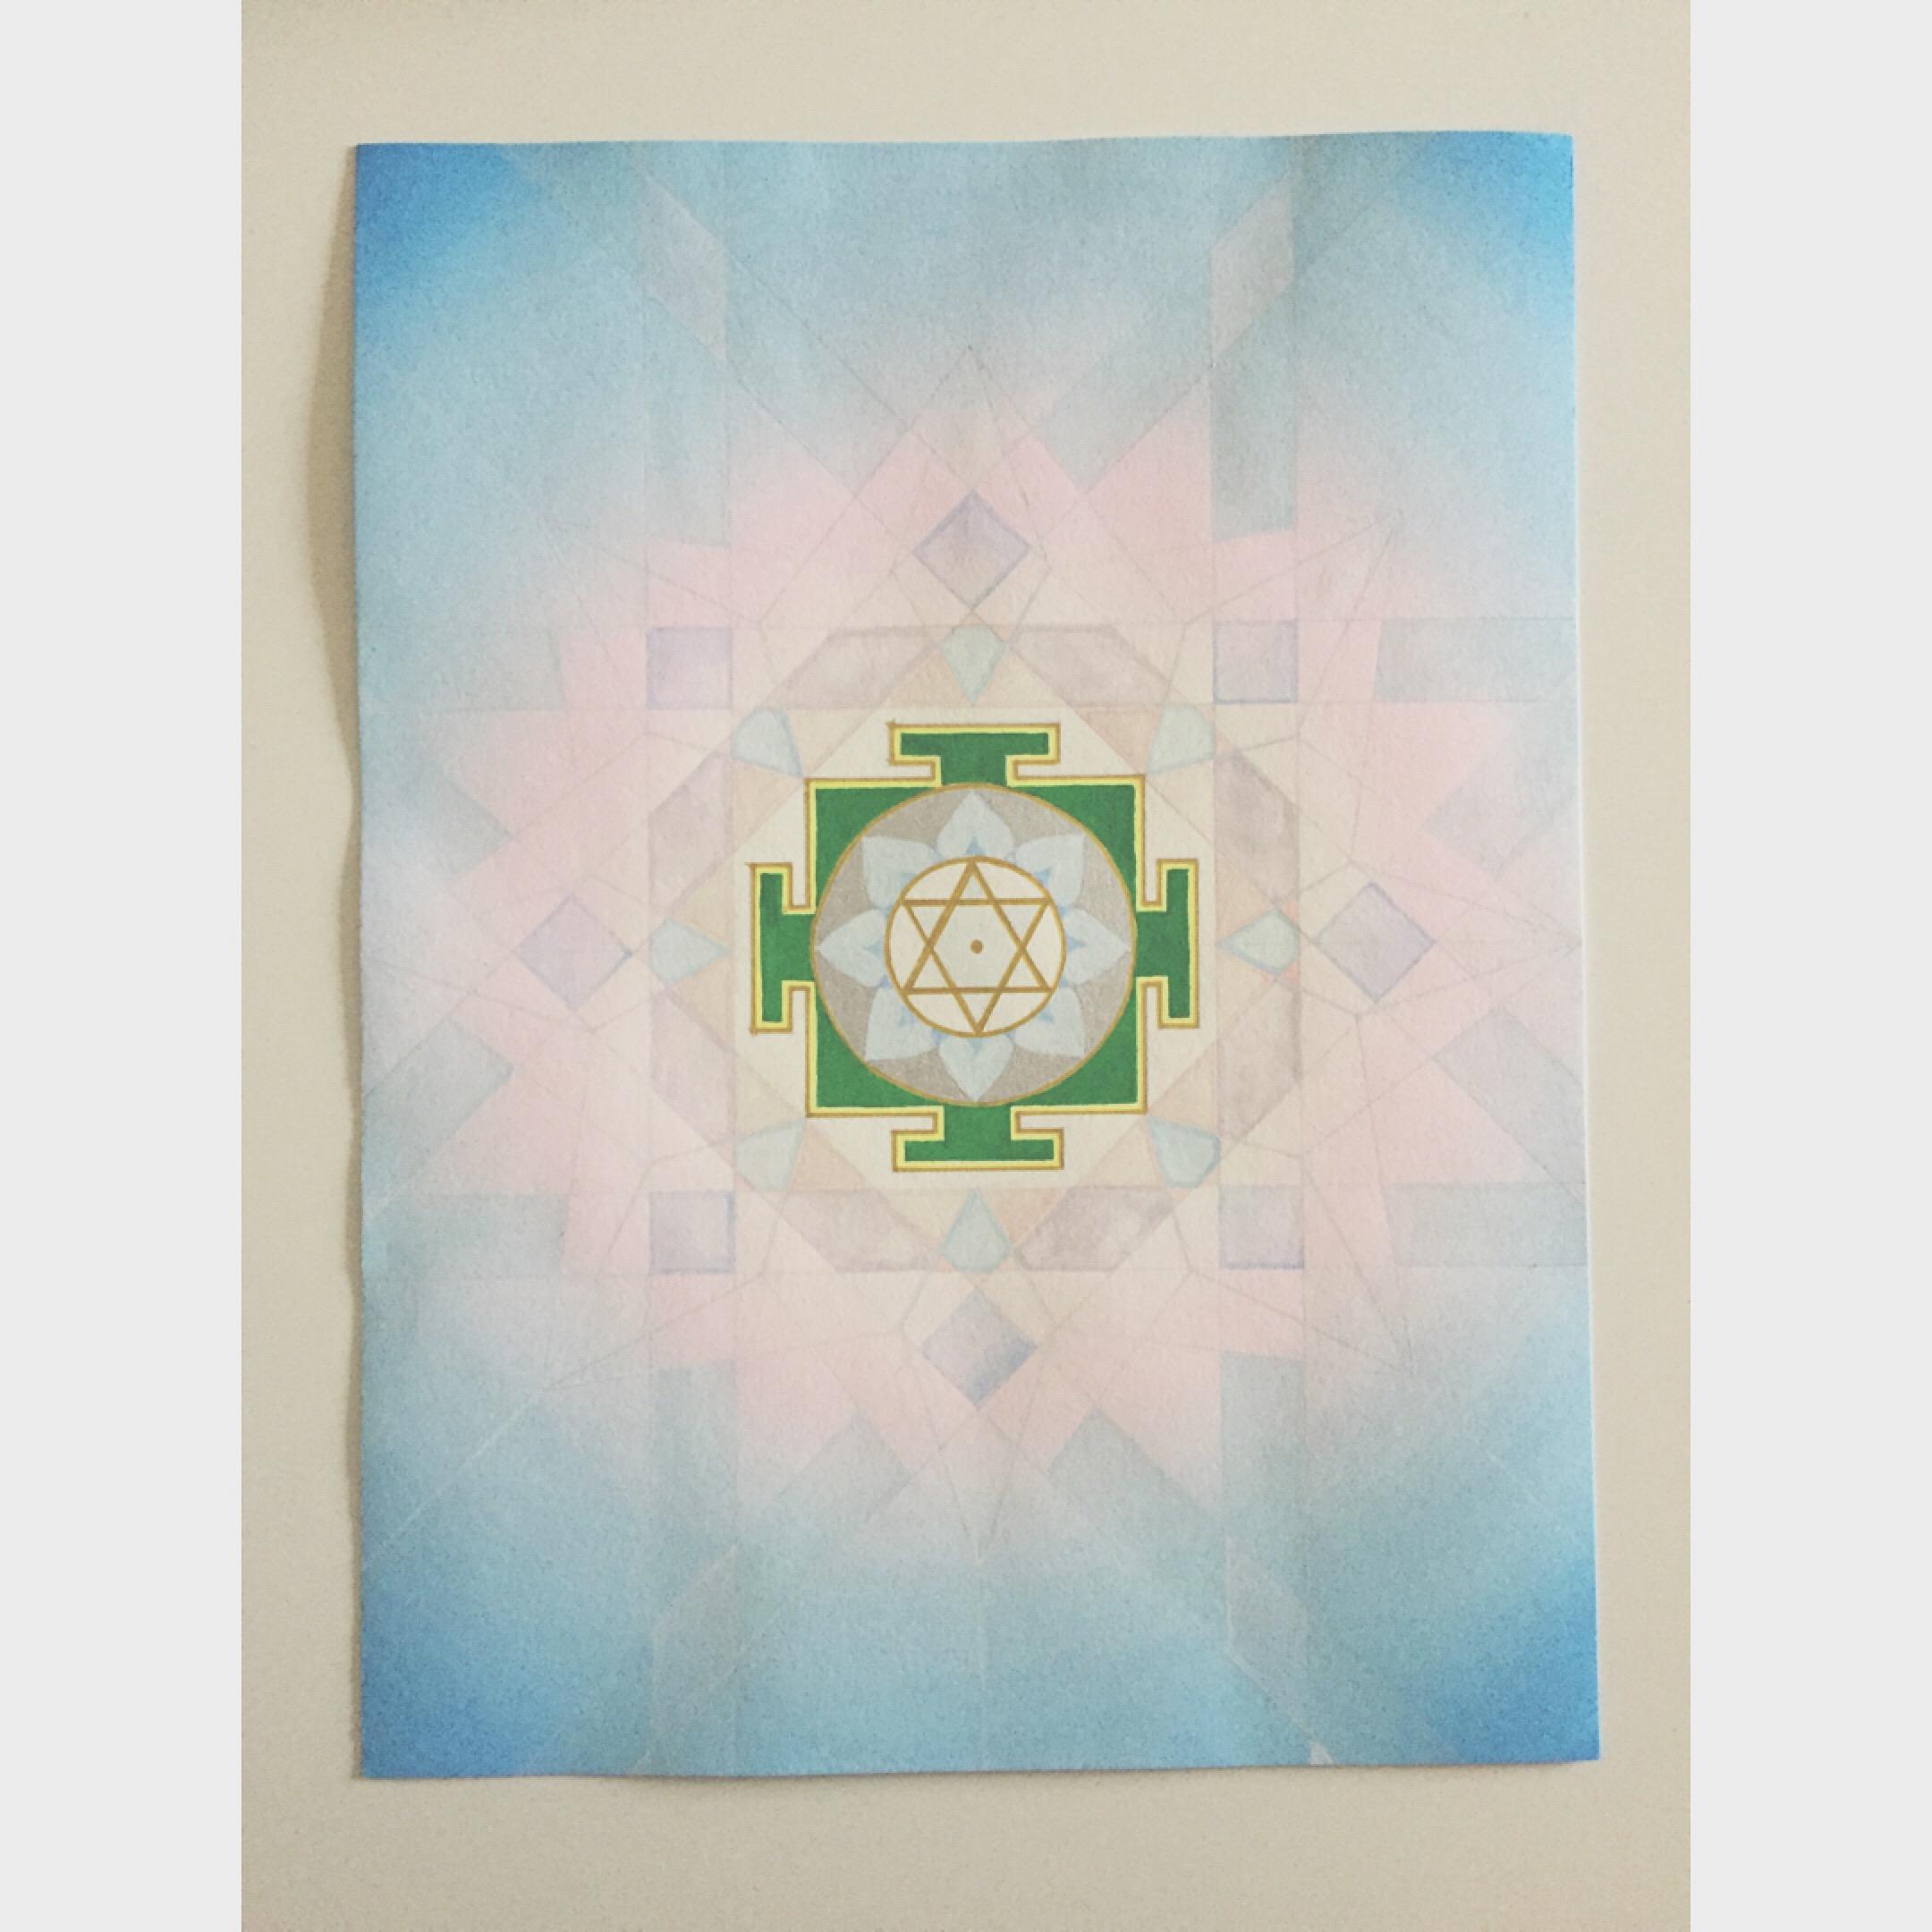 "#mantramonday my latest and favorite  mandala  and yantra,  Saraswati  the goddess of the arts and knowledge. with  #3 vedic square pattern behind for wisdom. the mantra: ""om hring saraswataye namaha om"" #mantra  #yantra  #mandala  #saraswati  #sacredart"